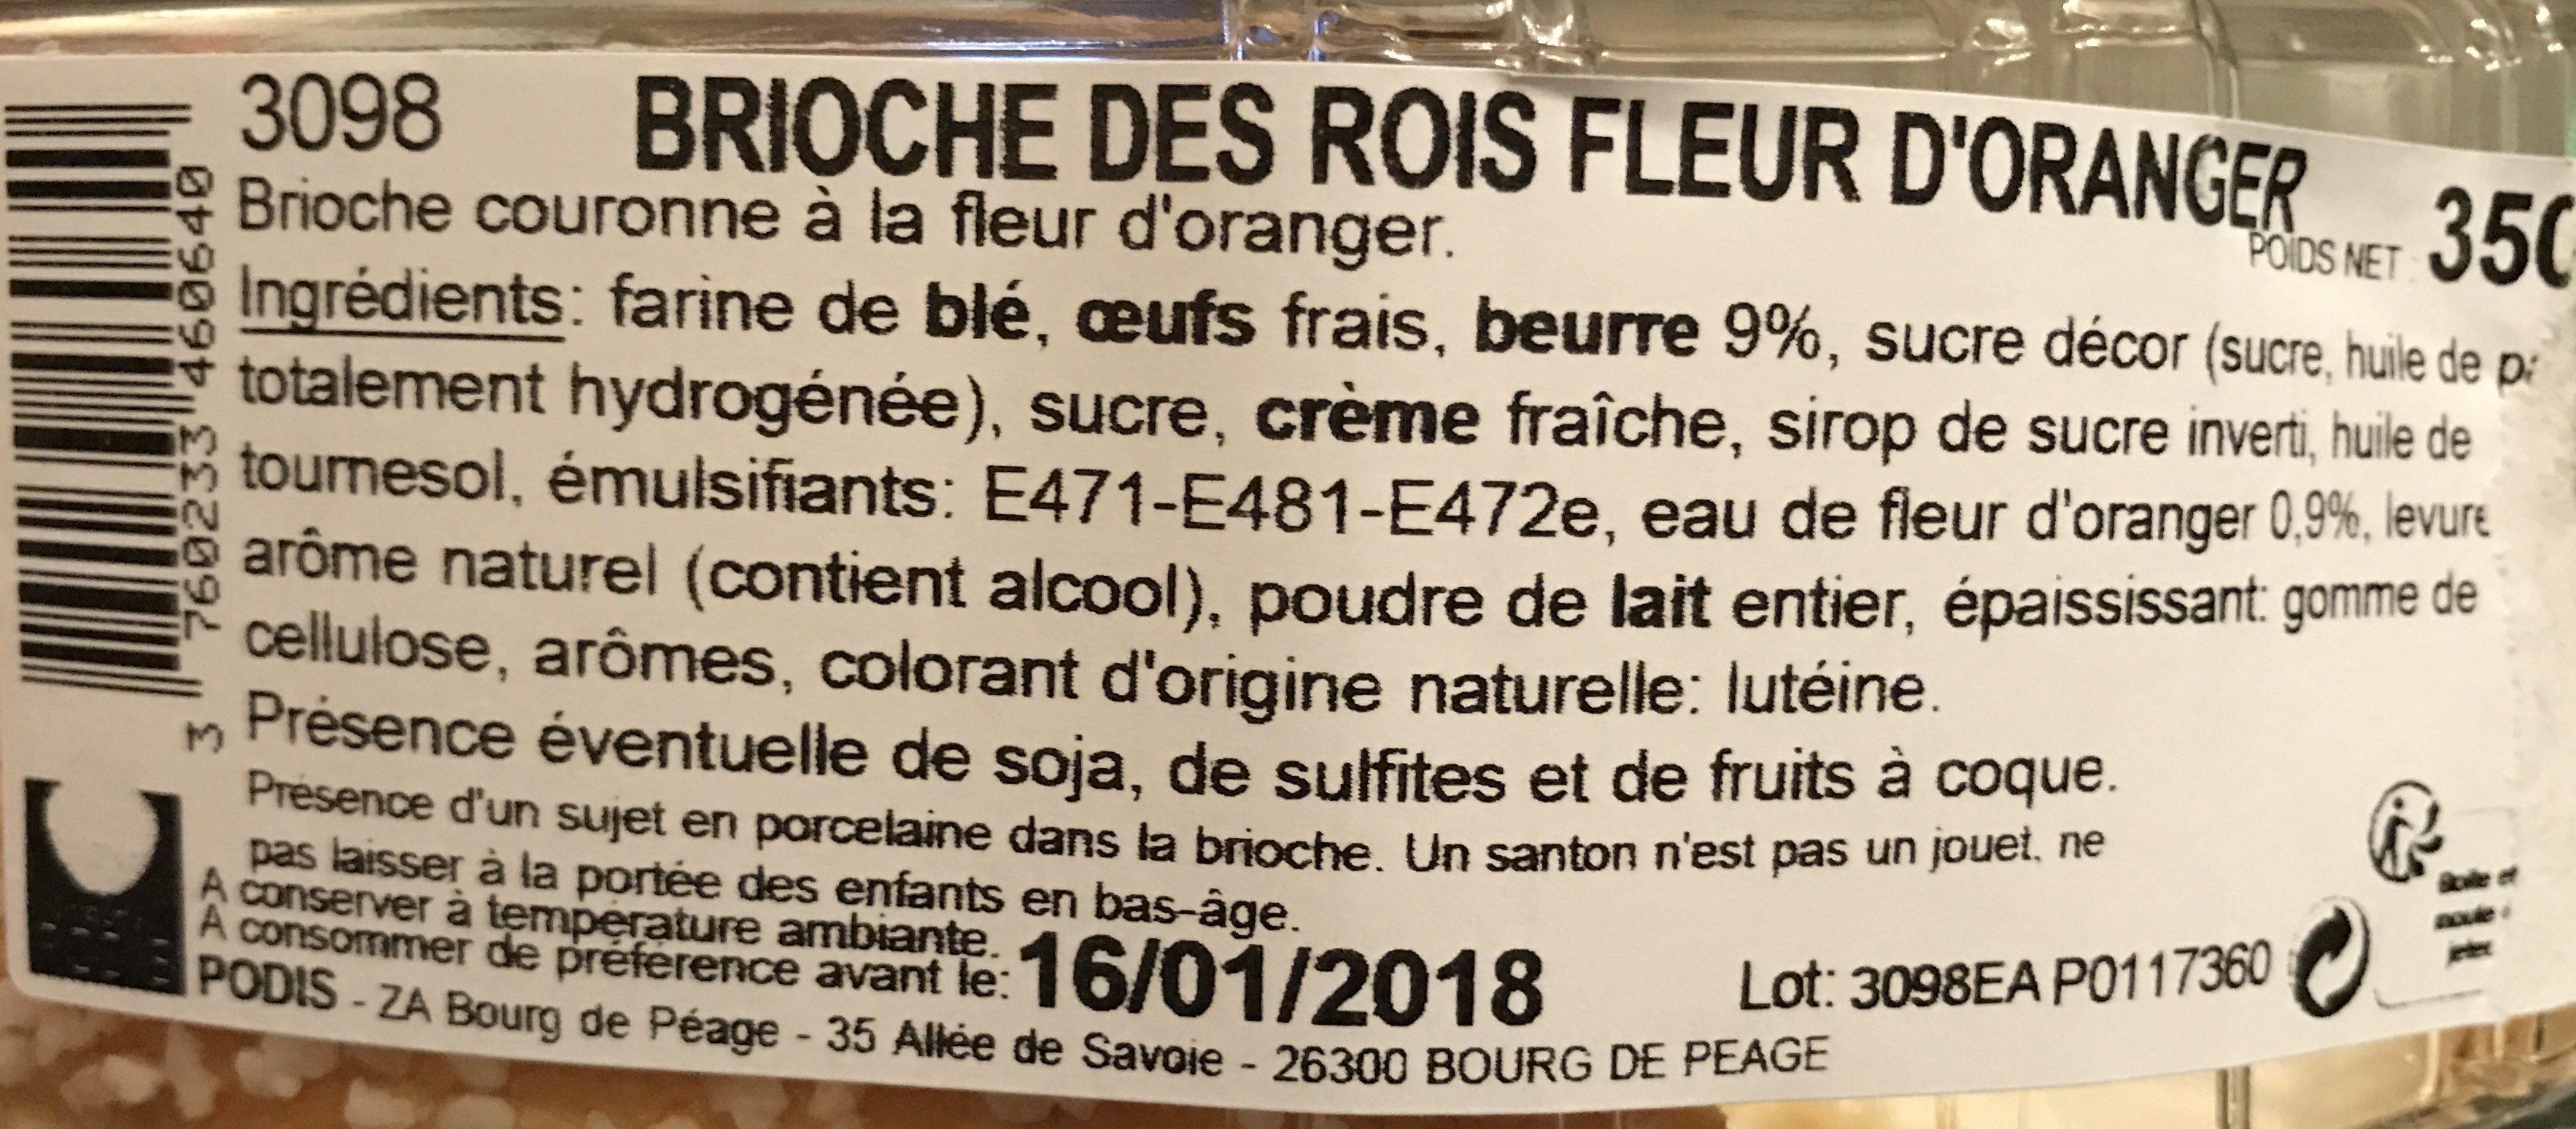 Brioche des Rois à la fleur d'oranger - Ingrediënten - fr